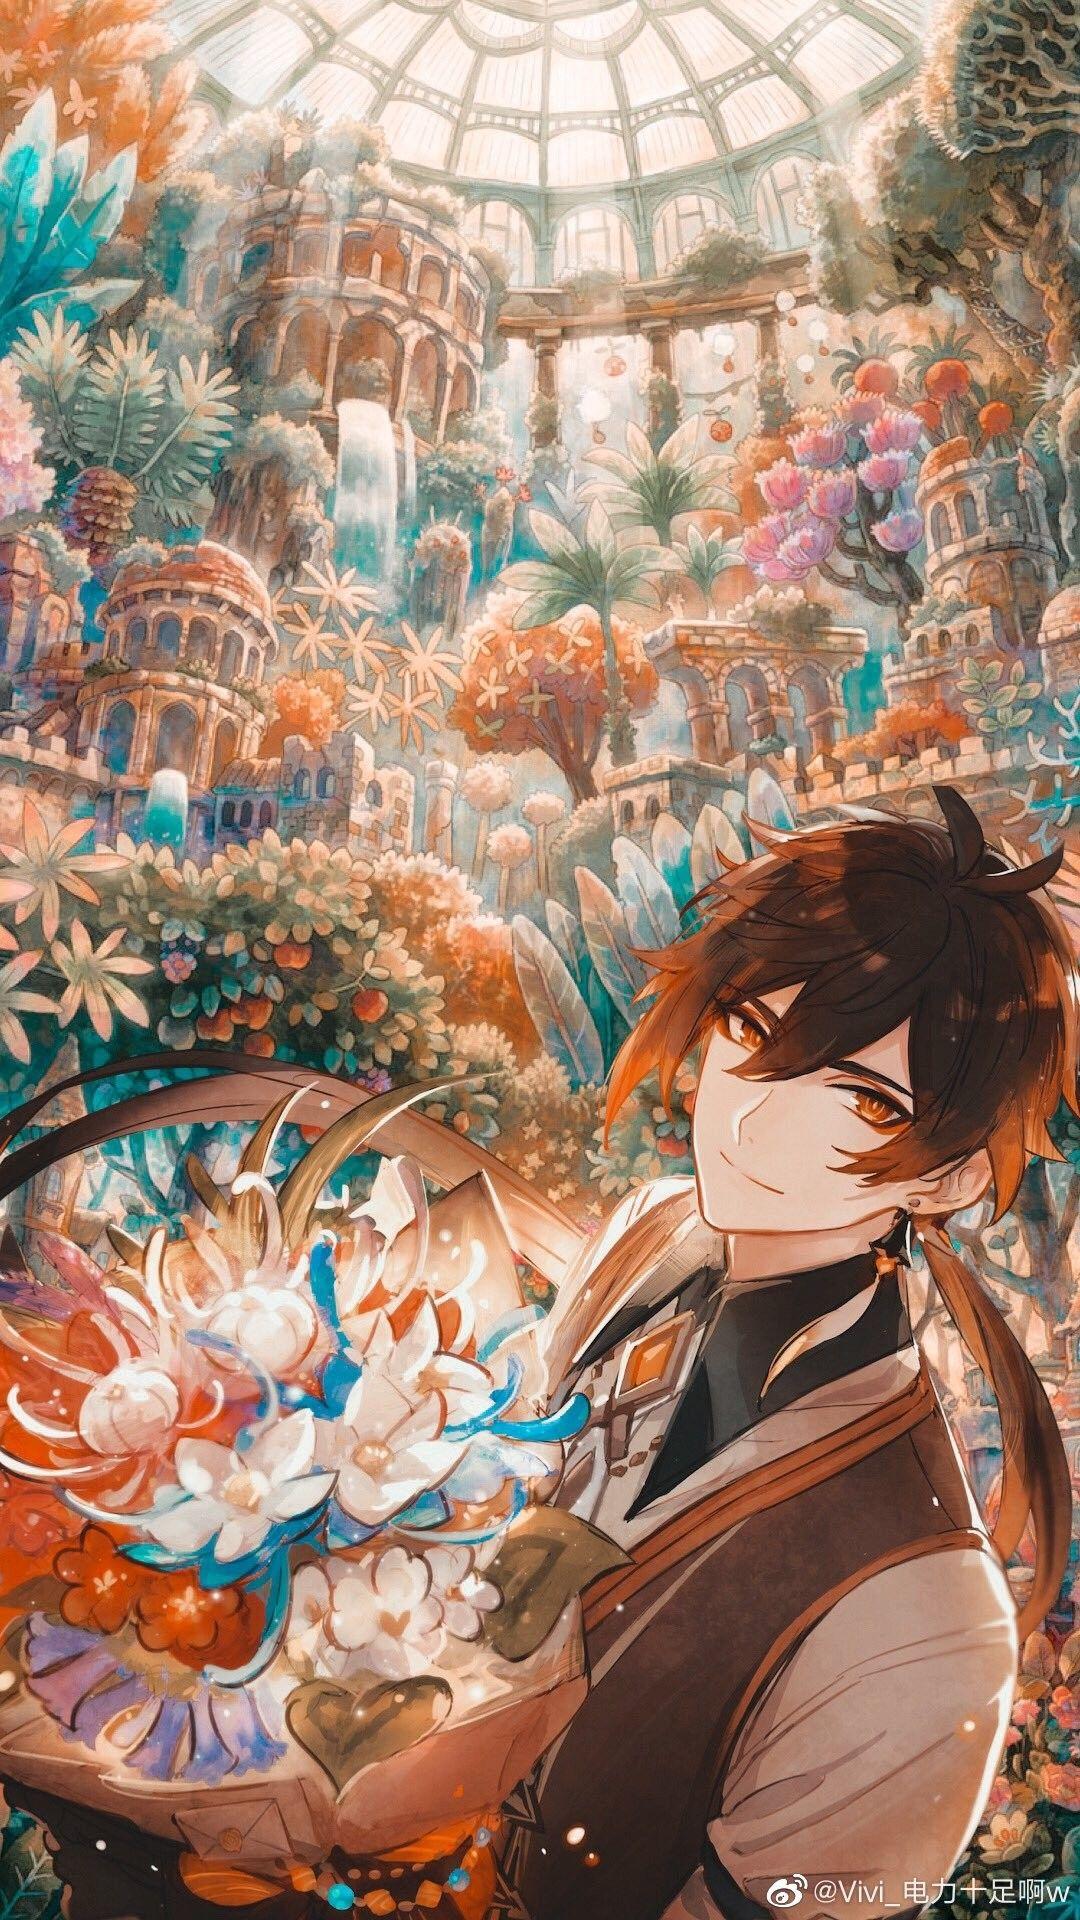 Zhongli Special Iphone Wallpaper In 2021 Anime Art Anime Kawaii Anime High quality anime boy wallpaper iphone